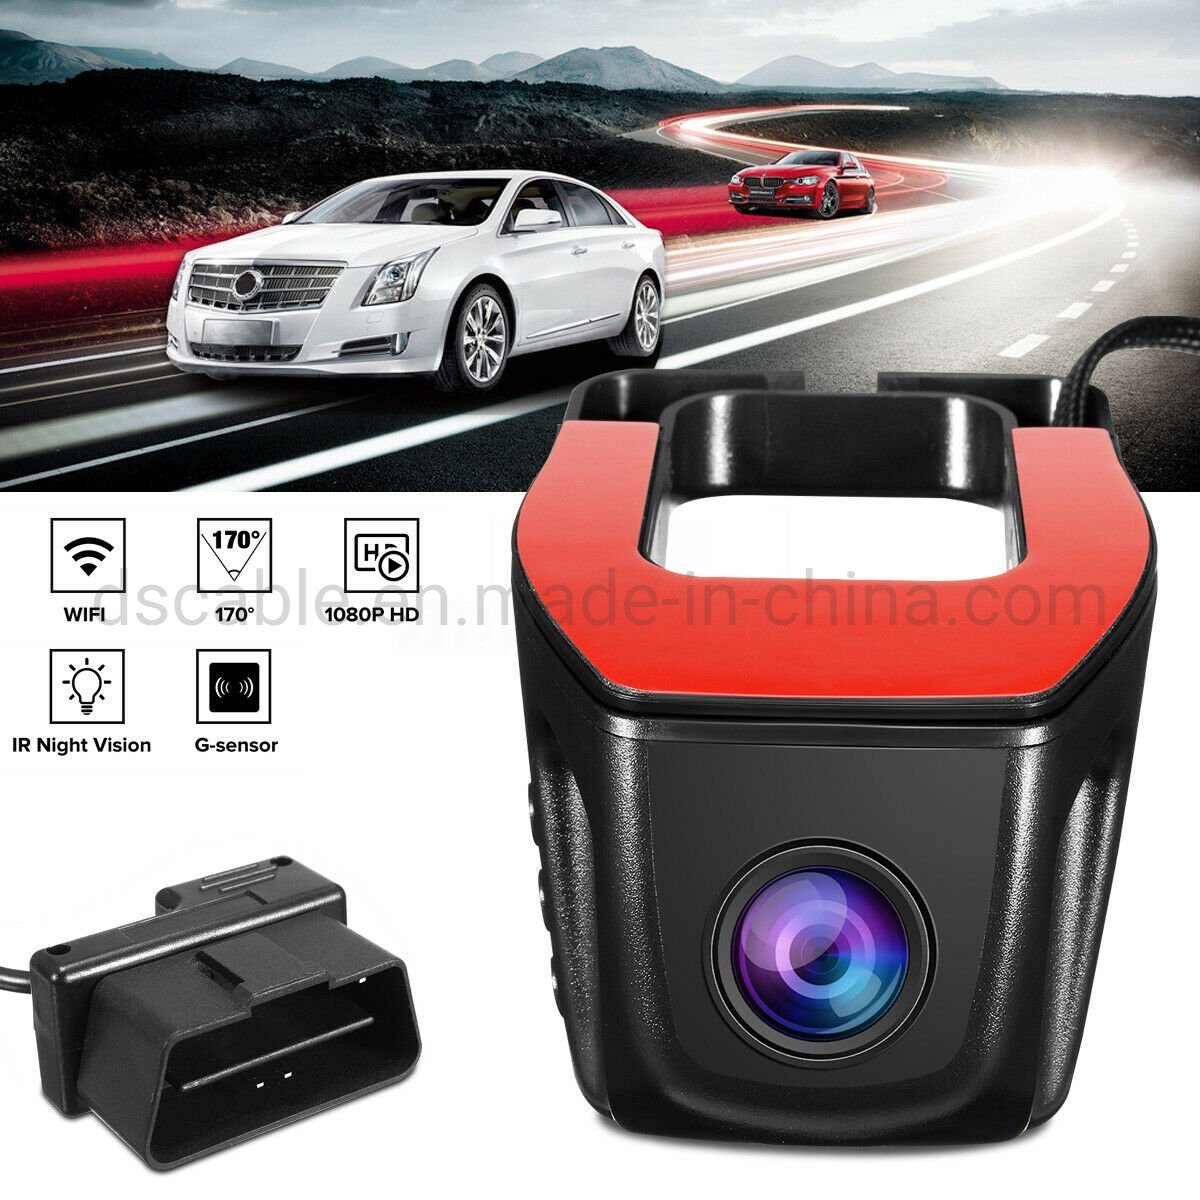 1080P WIFI DVR Vehicle Camera Hidden Car HD Video Recorder Dash Cam Night Vision